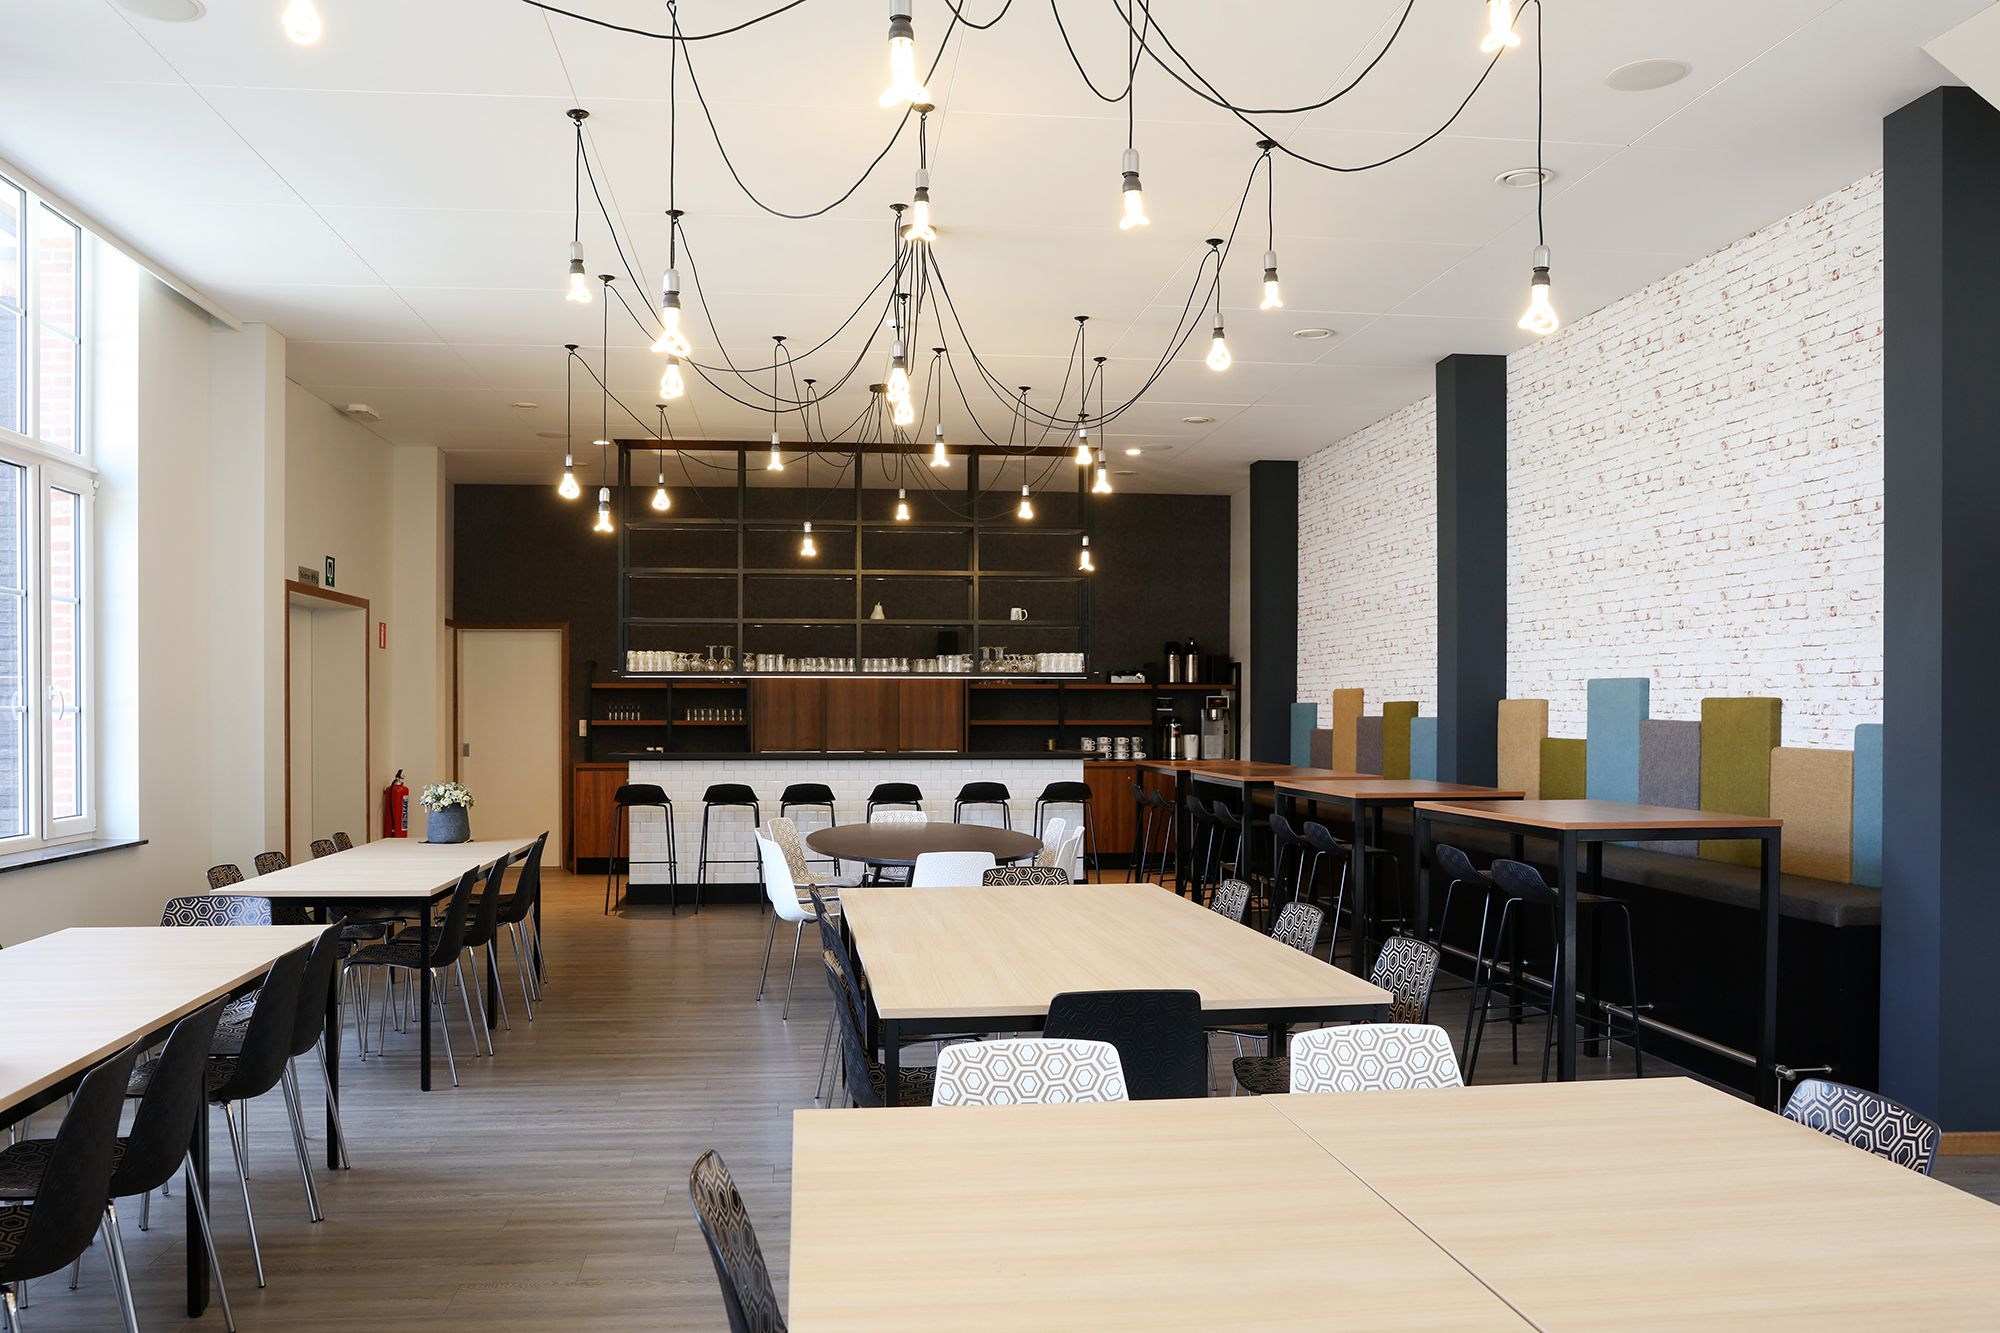 Modern Gezellig Interieur : Timmermans interieur fanfarezaal dommelgalm neerpelt design